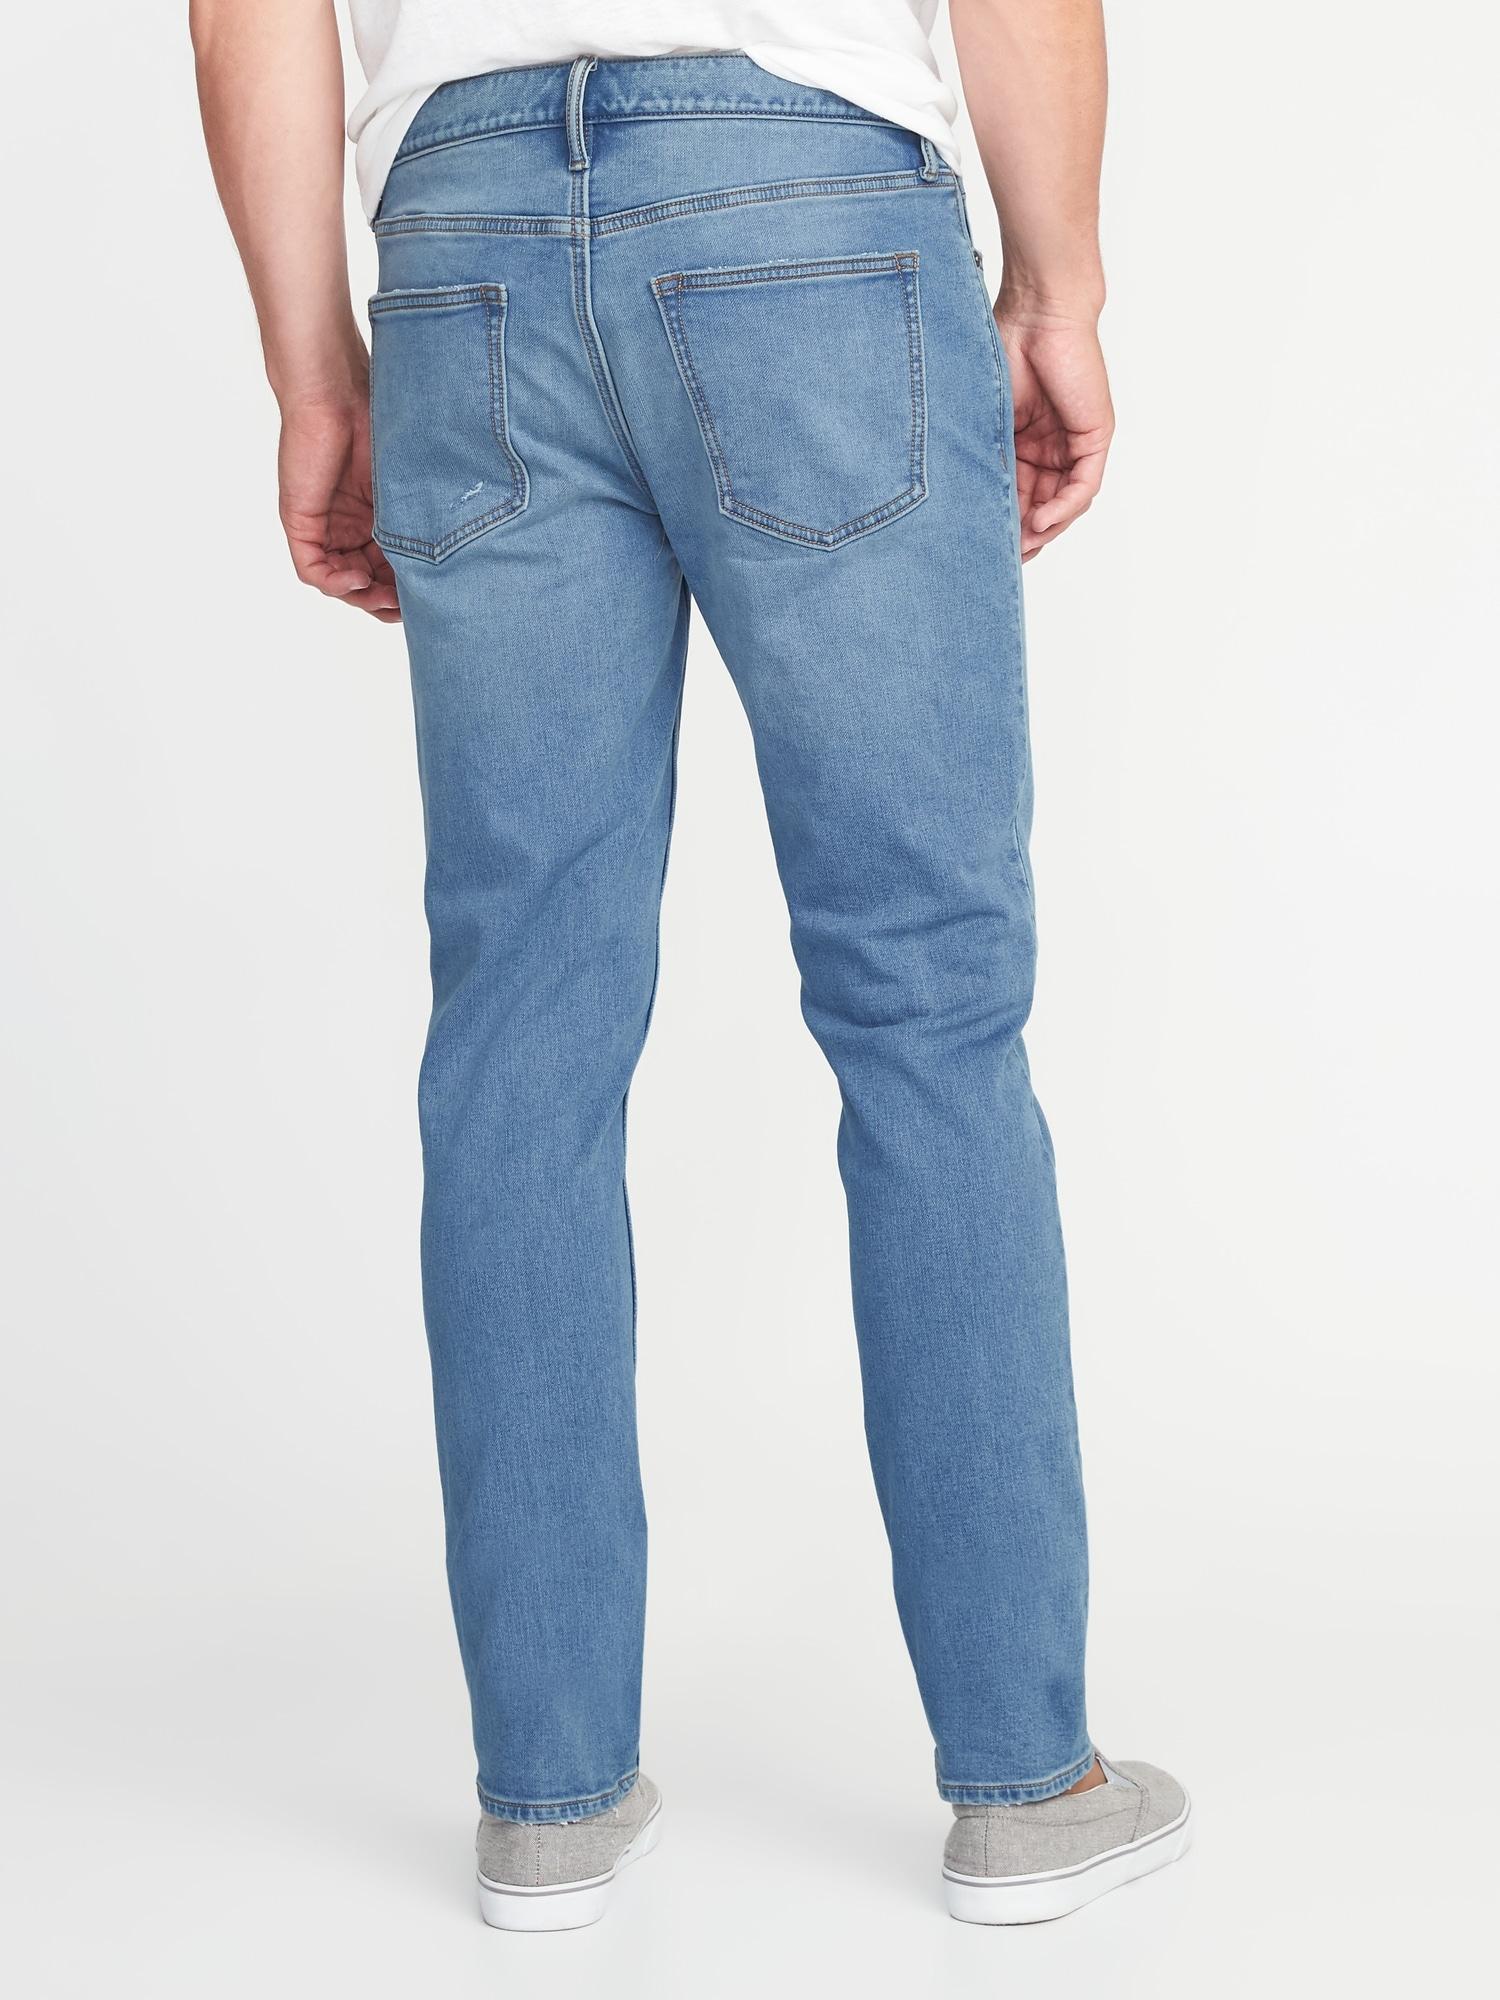 7083ac03 Slim 24/7 Built-In Flex Jeans for Men | Old Navy